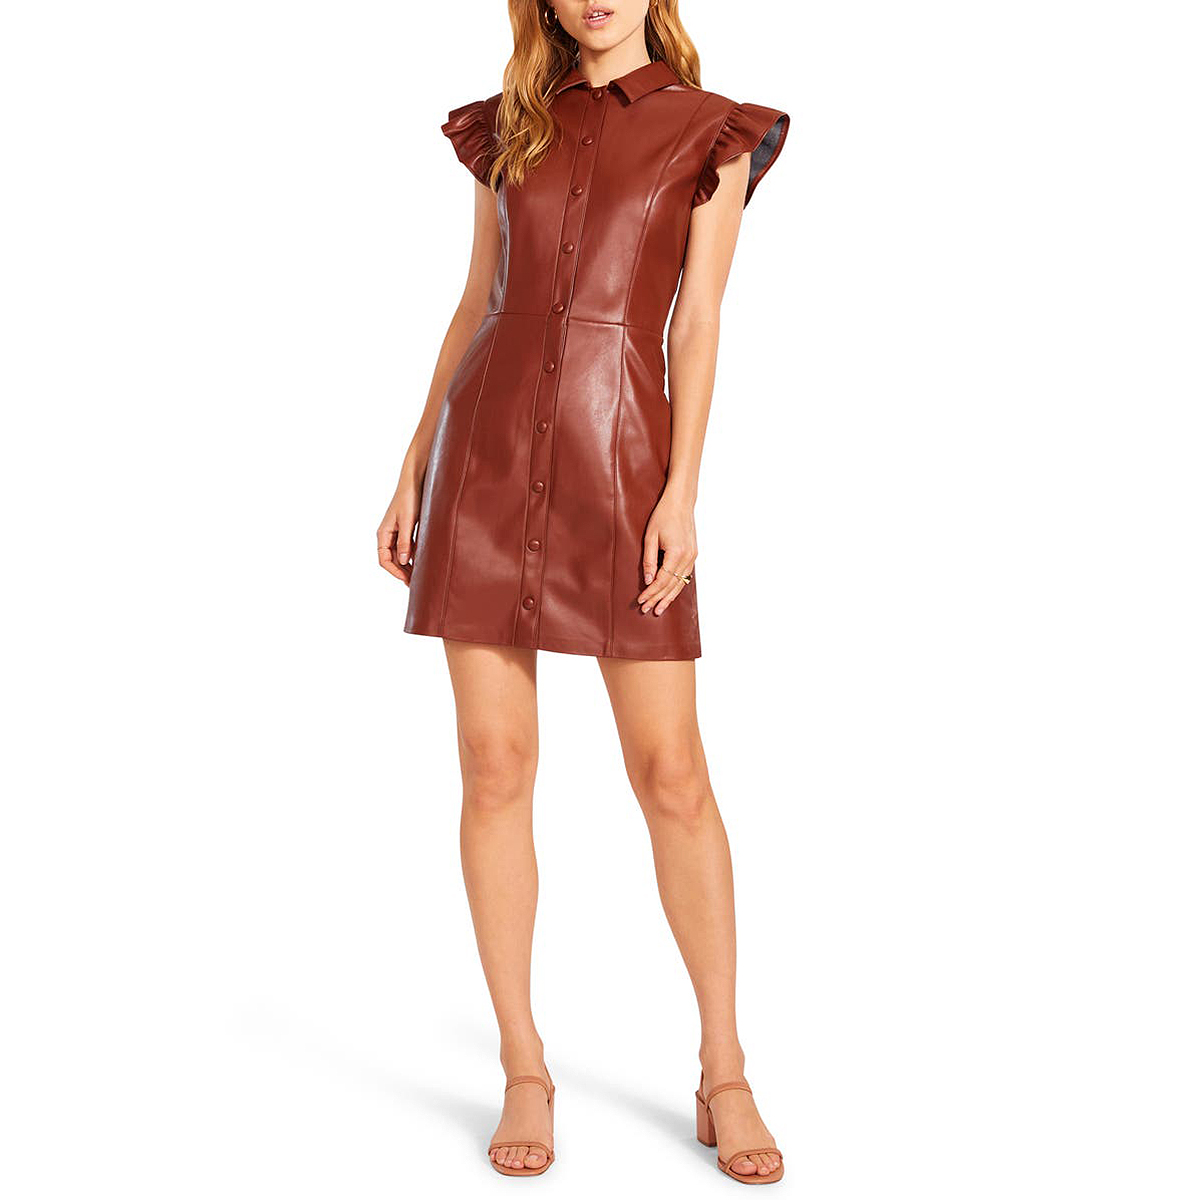 nordstrom-anniversary-sale-zara-style-bb-dakota-steve-madden-faux-leather-dress